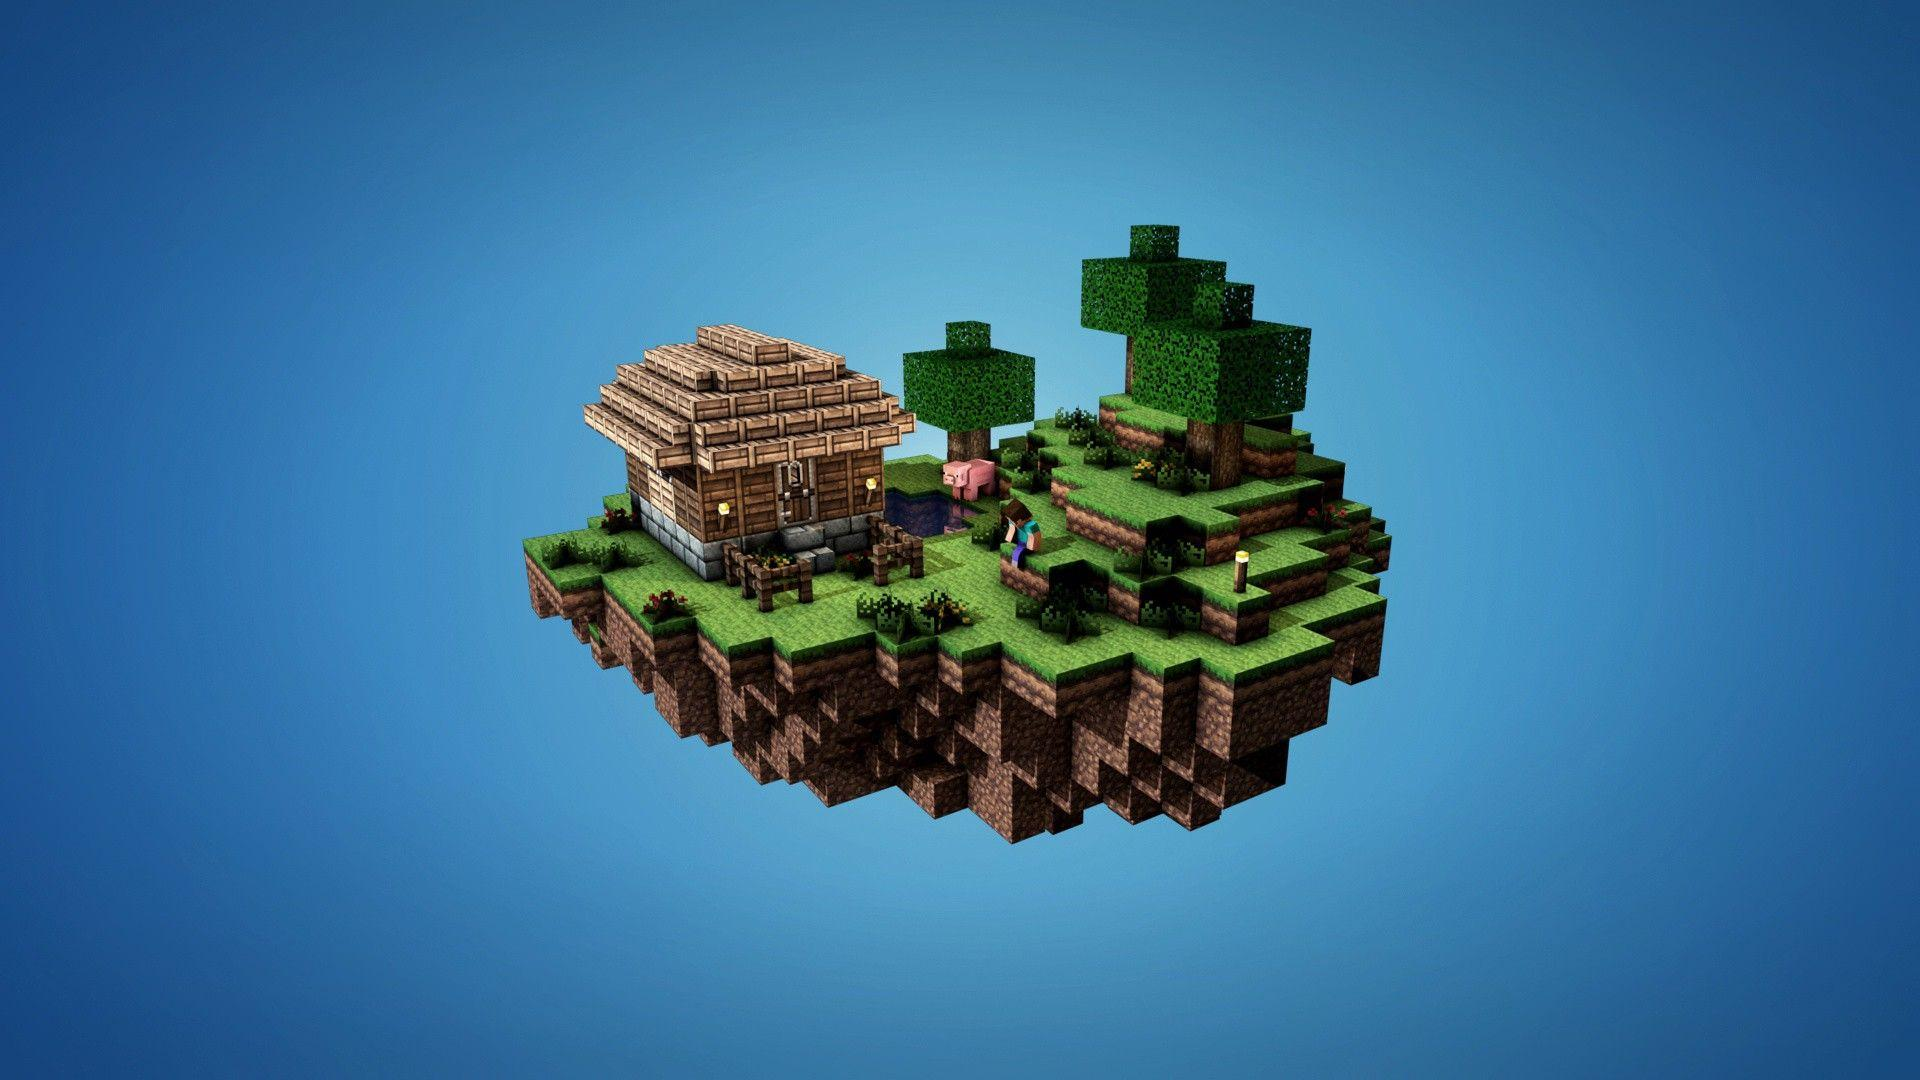 Minimalistic Minecraft Wallpaper - Destkop Backgrounds